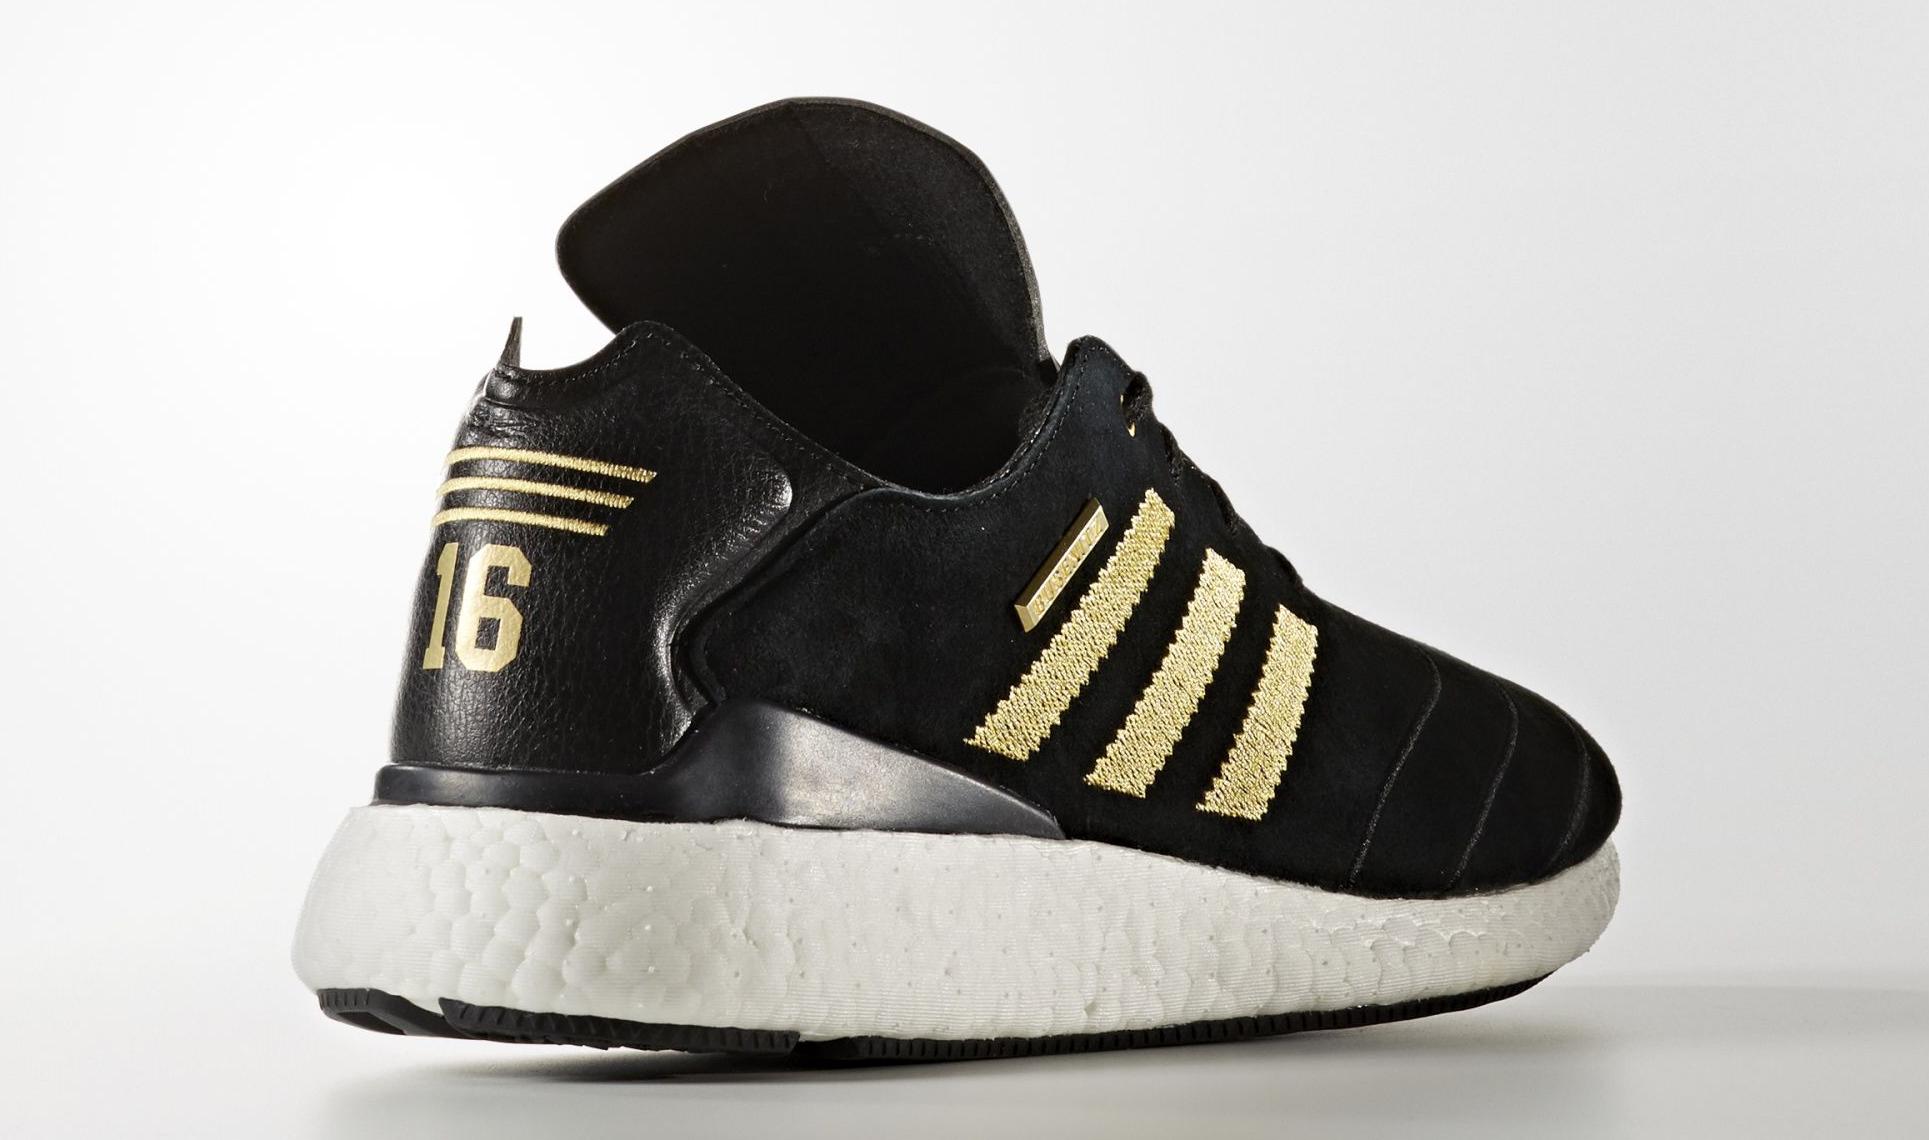 Adidas Busenitz 10 Year Anniversary Black Gold Heel